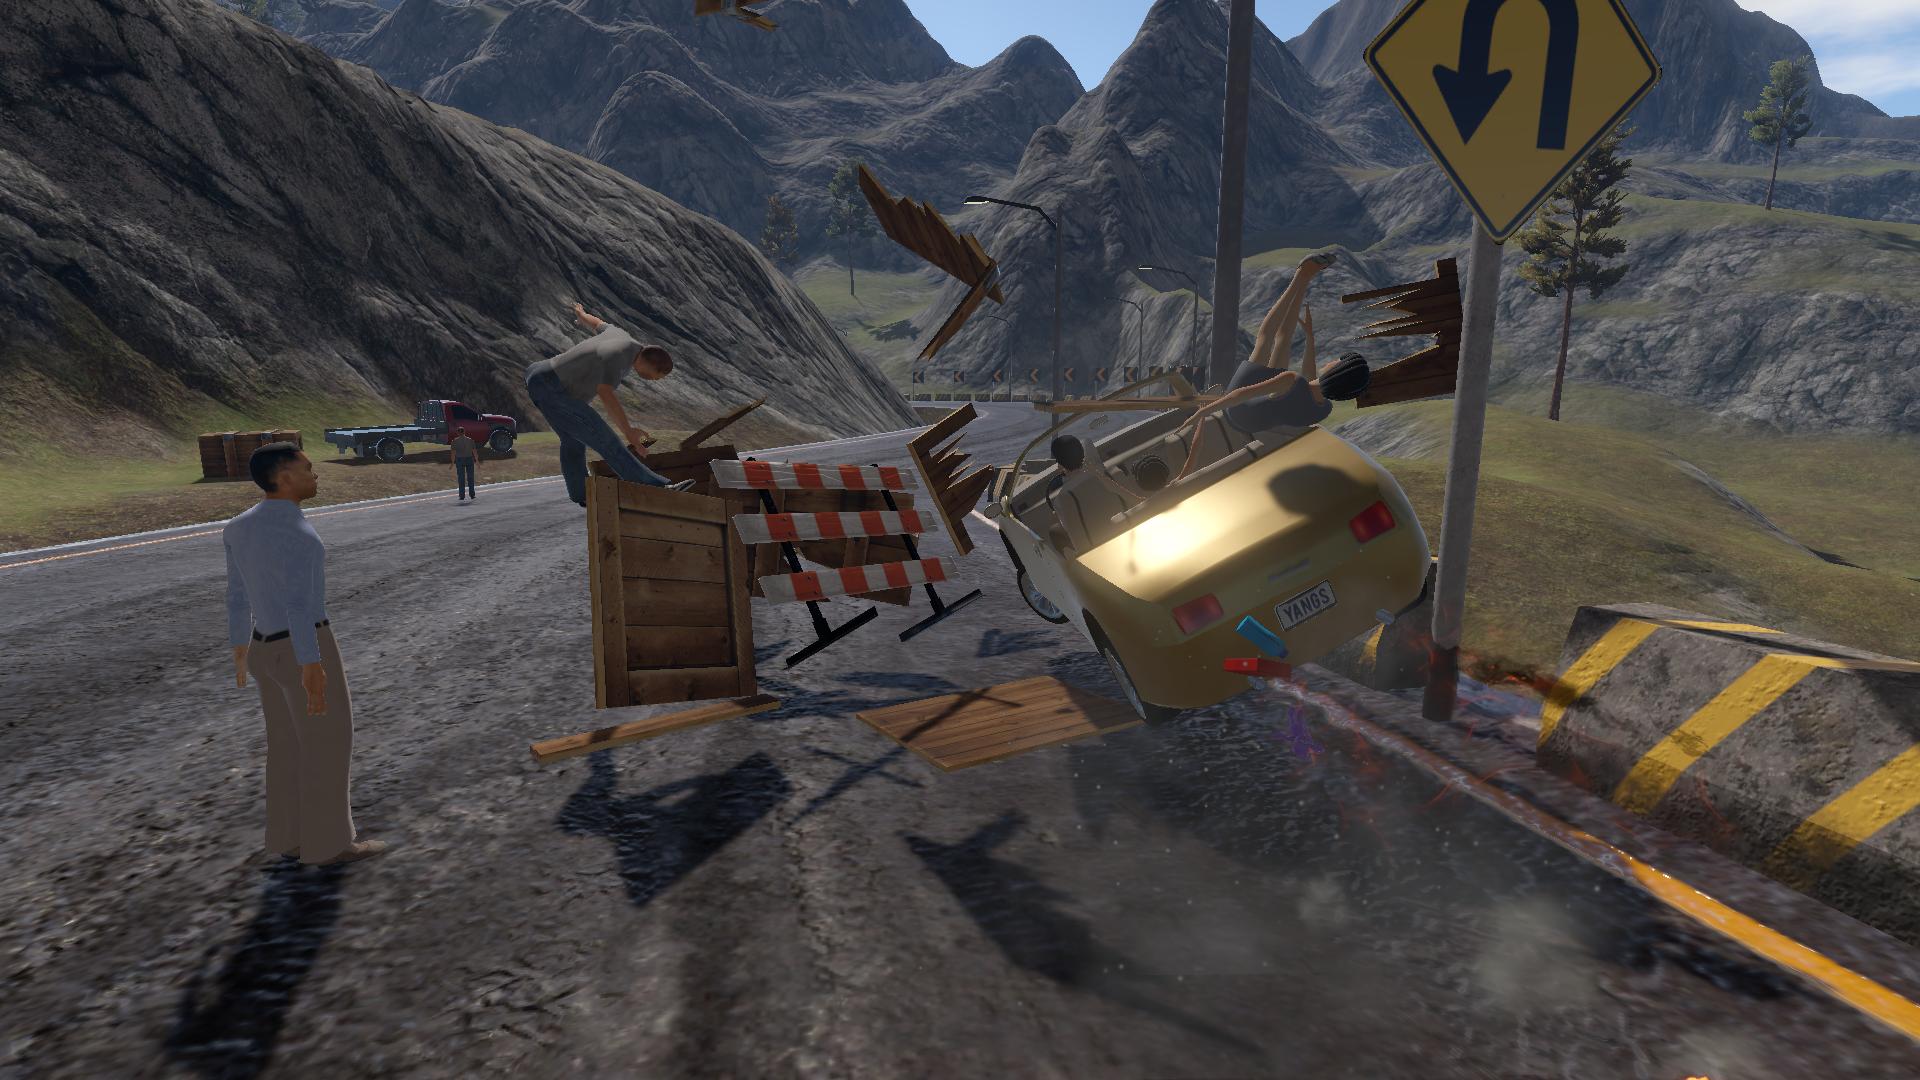 Construction Zone Crash